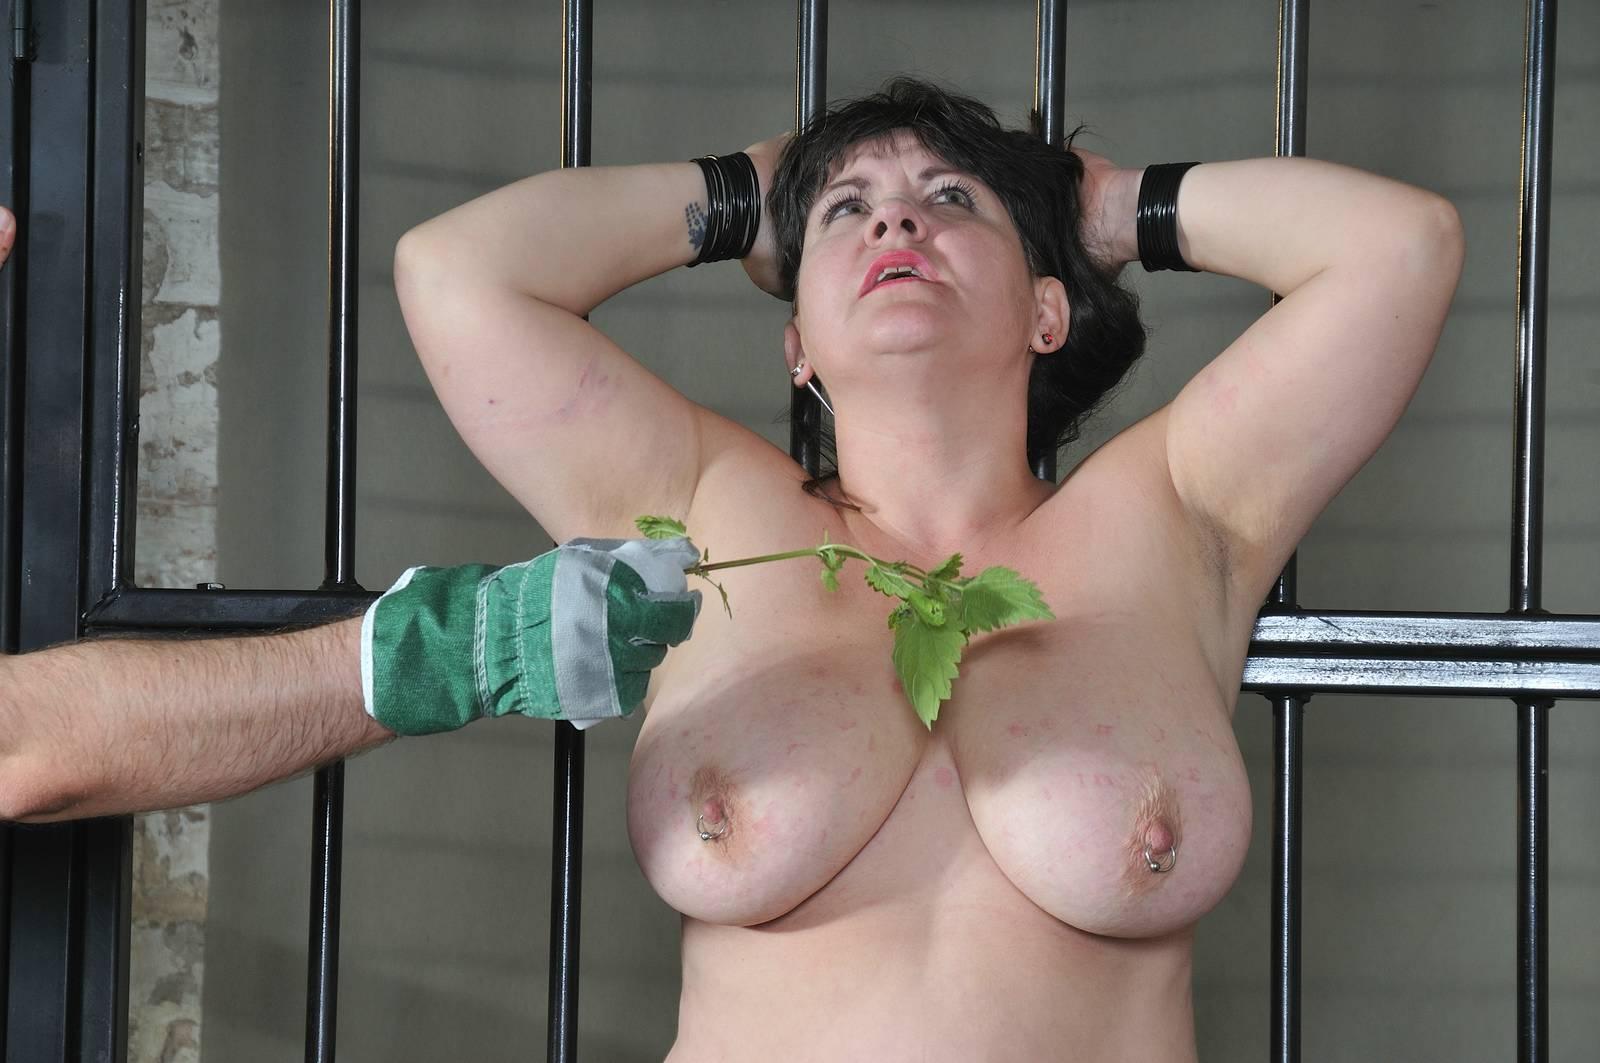 Black cherry porn star